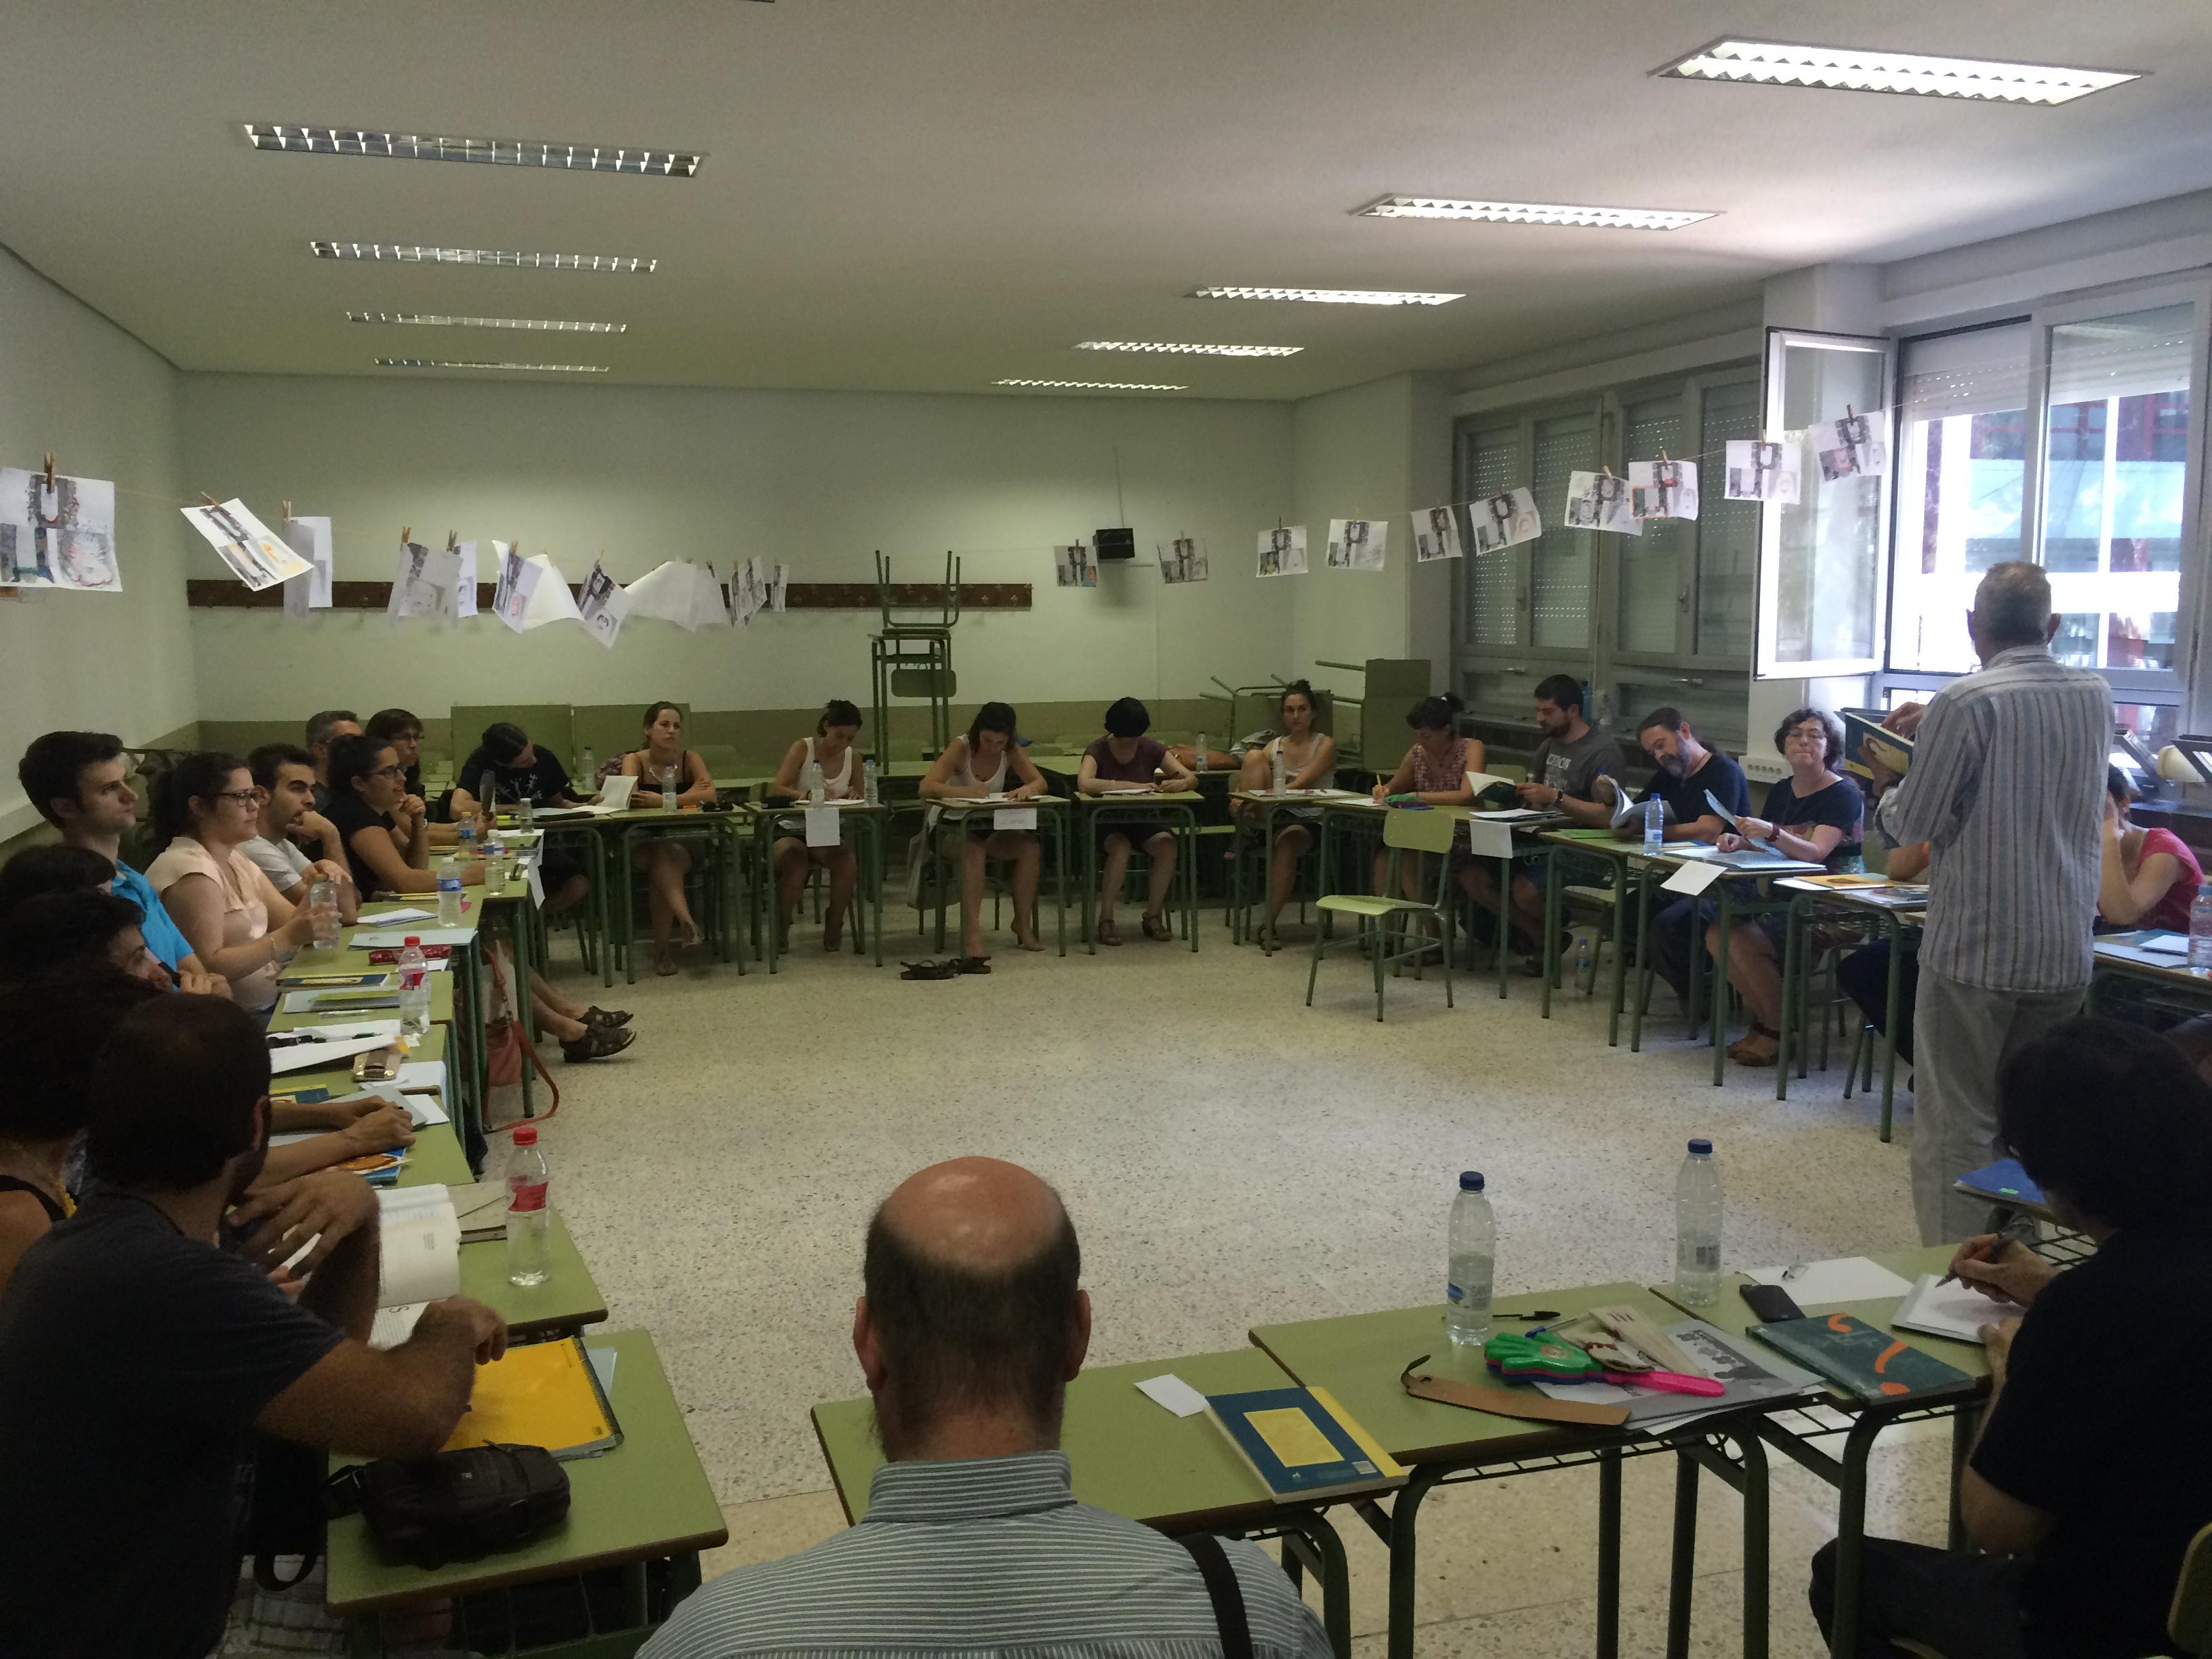 Angélica Sátiro » Blog Archive » FILOSOFÍA PARA NIÑOS ... - photo#7